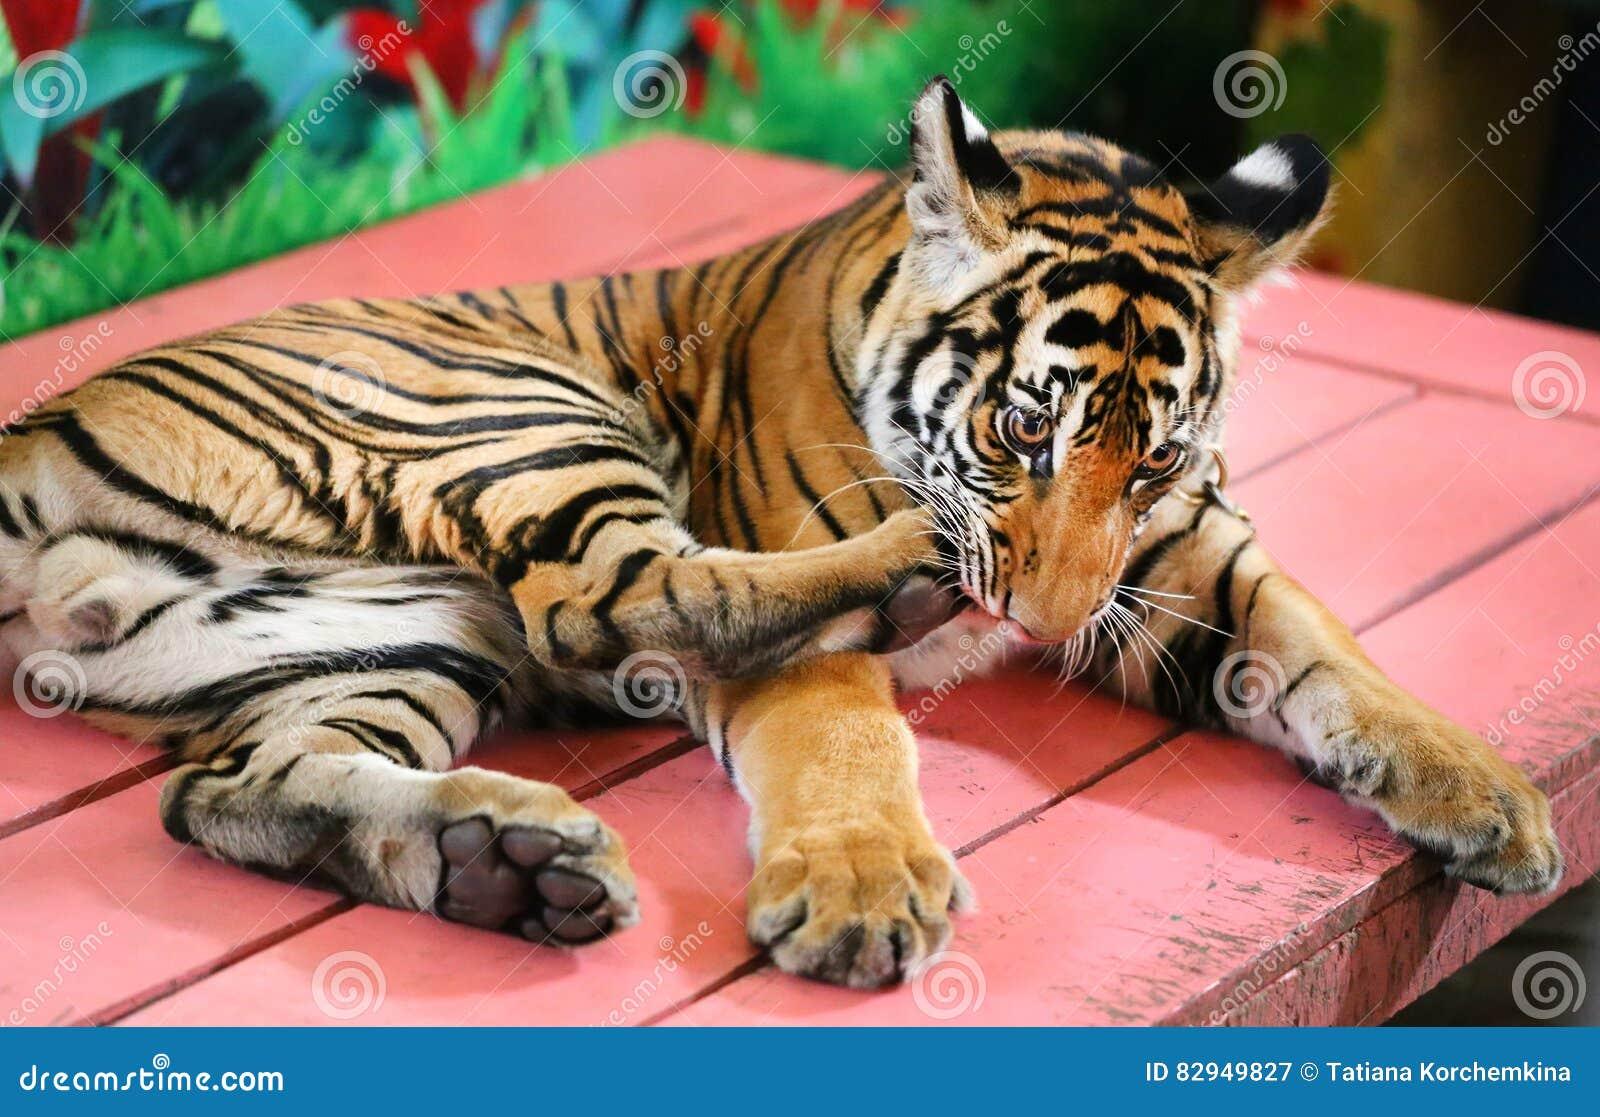 Funny little tiger